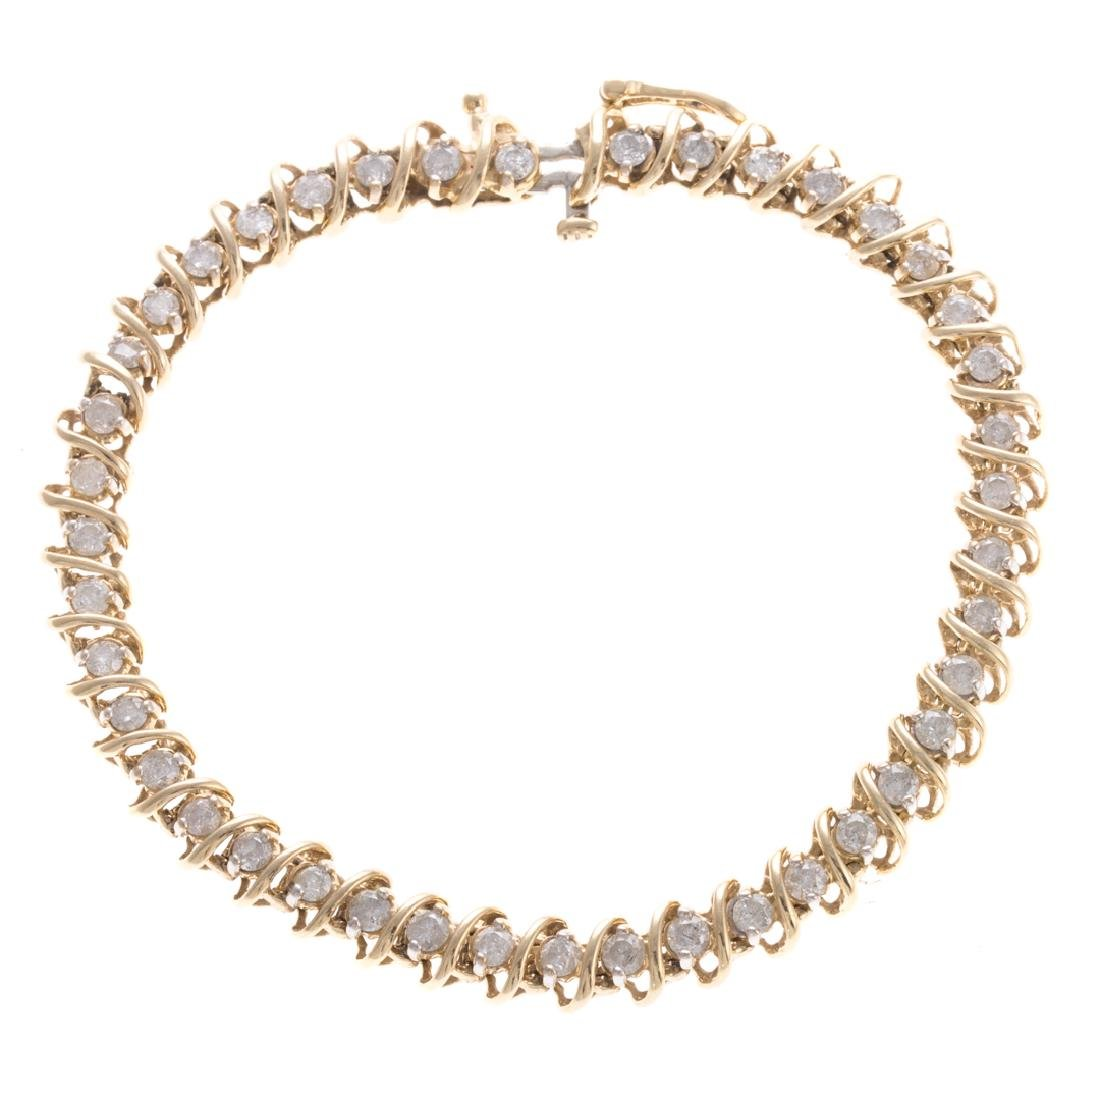 A Lady's Diamond Straight Line Bracelet in